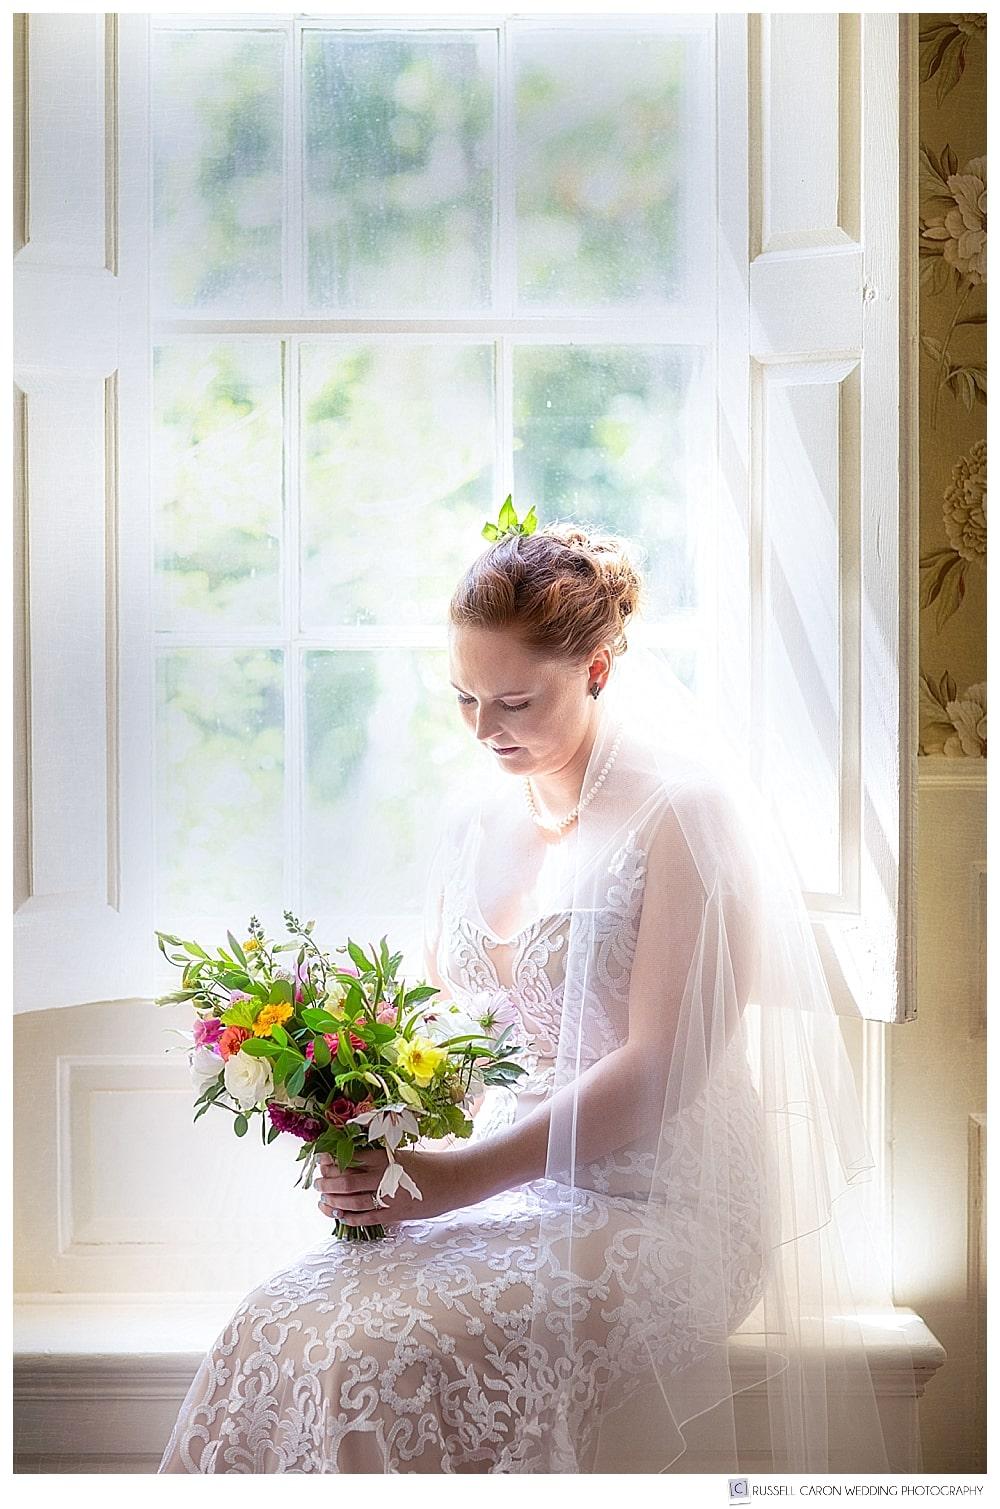 beautiful bridal portrait of bride sitting on a window seat at the 1774 Inn, Phippsburg, Maine